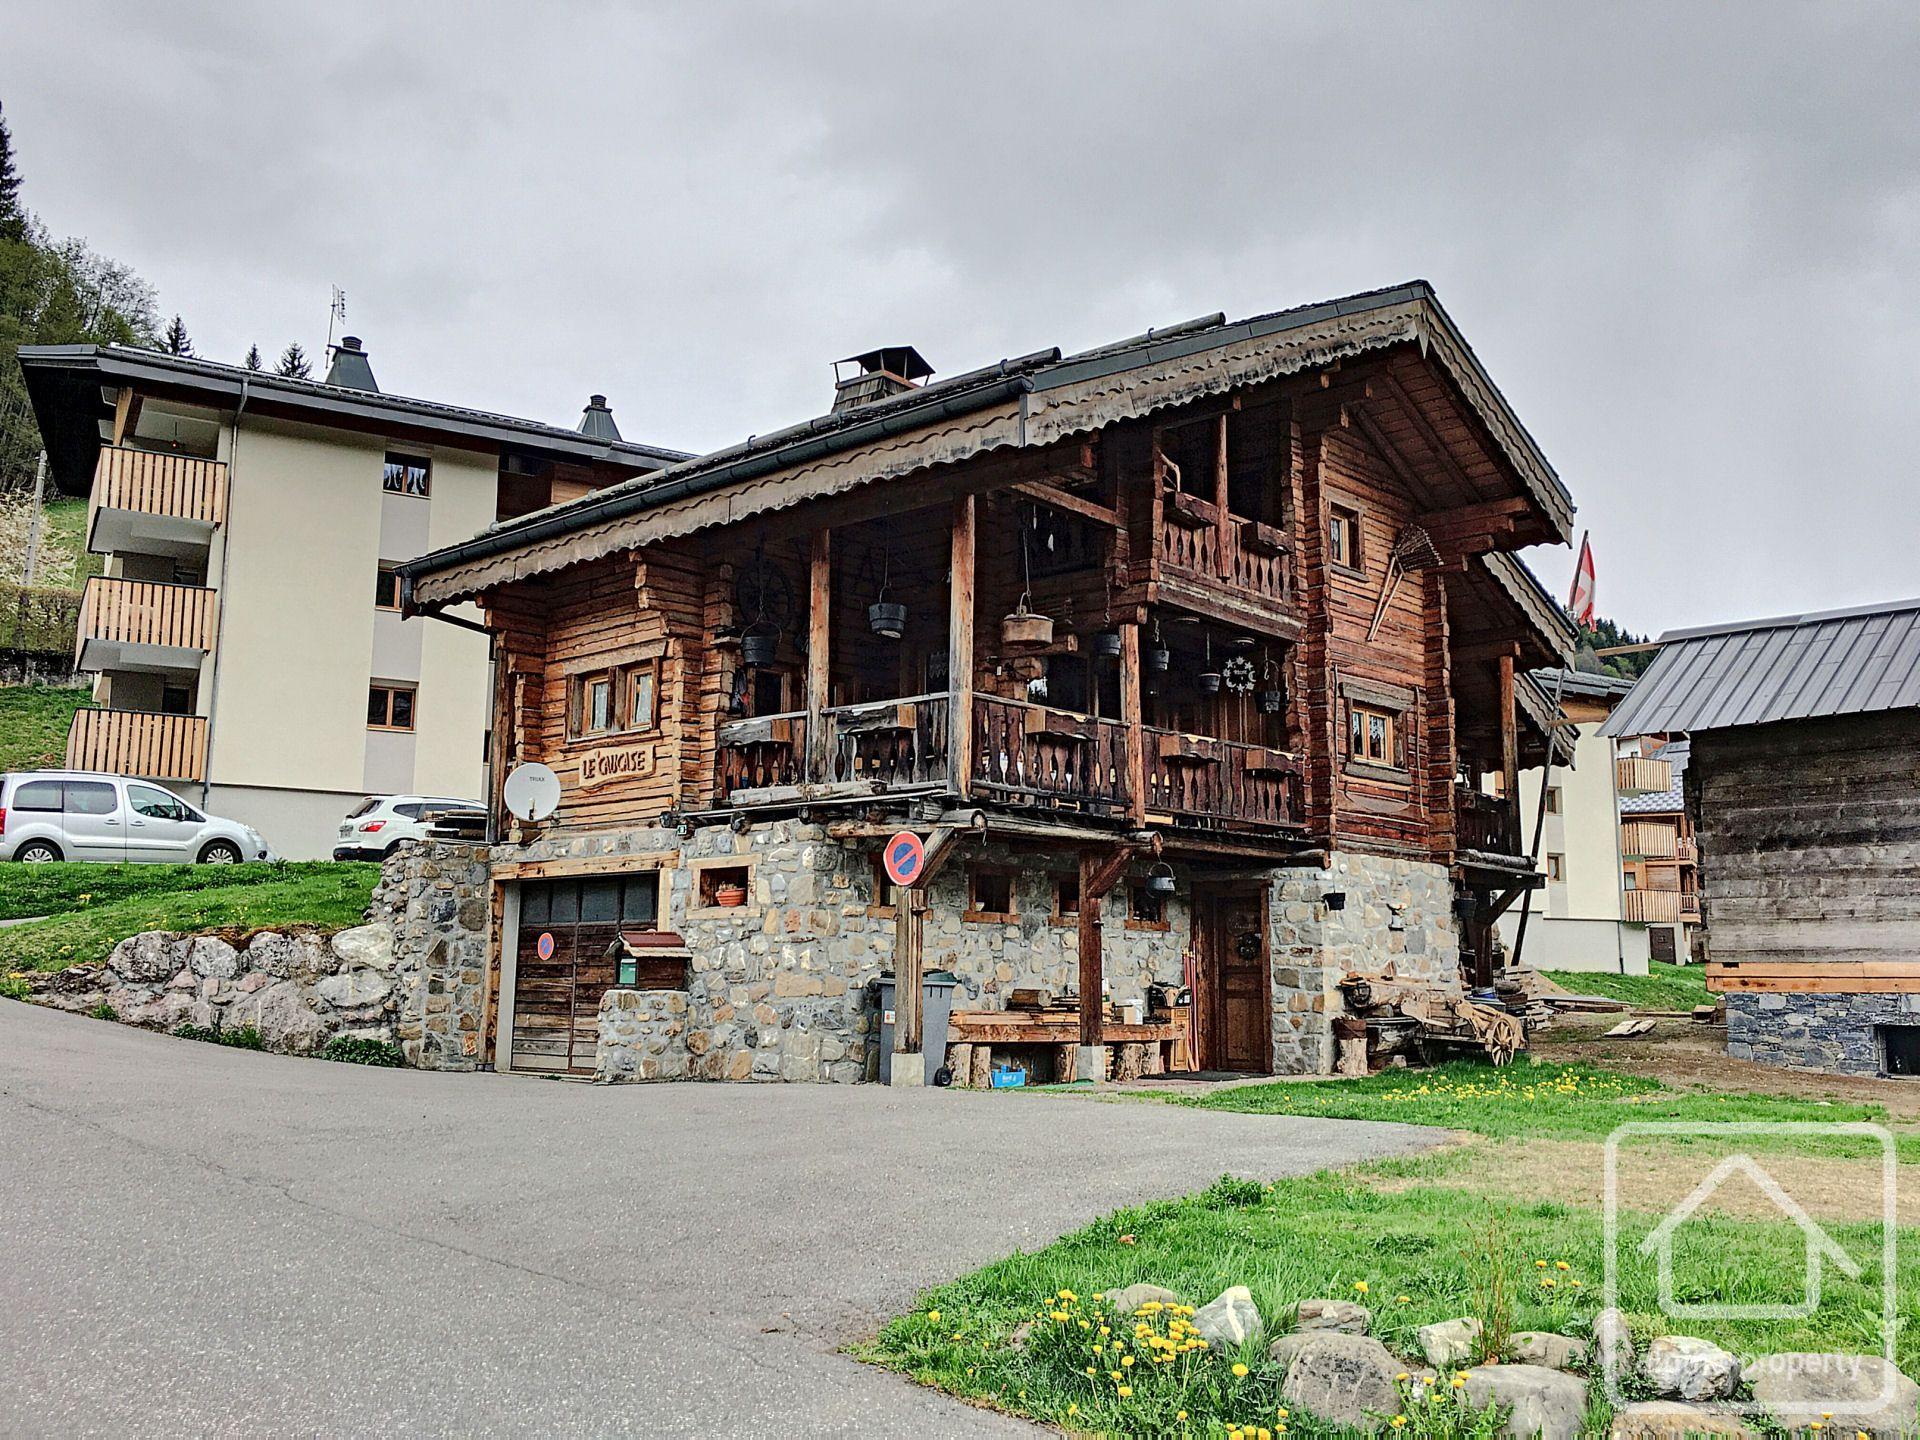 Chalet-style house: Alpine charm